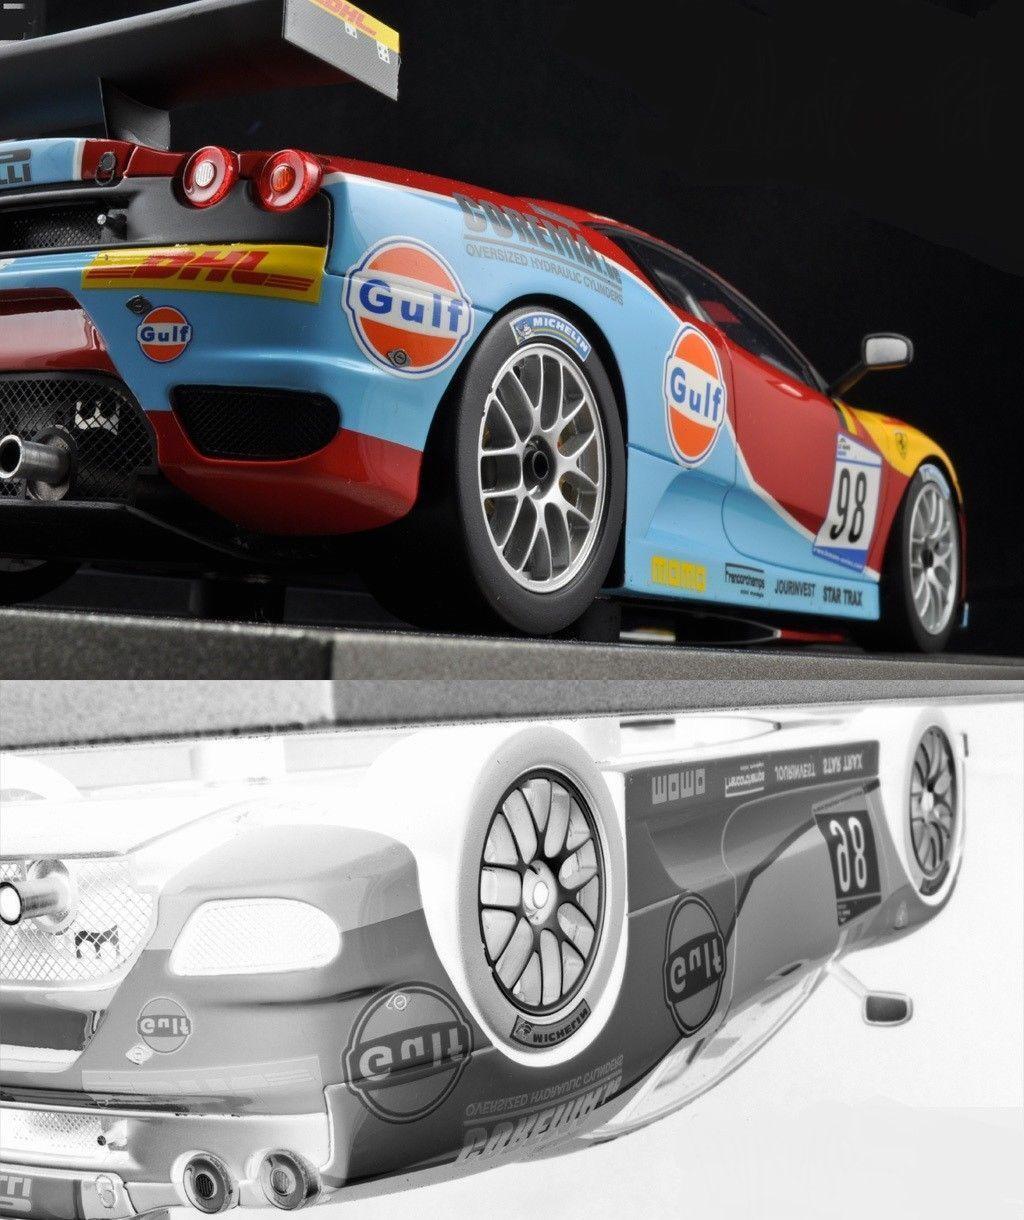 GULF Ferrari Built Race Car GP 40 F 1 Sport Racing GT 24 Hot Rod 12 Model 25 GTO